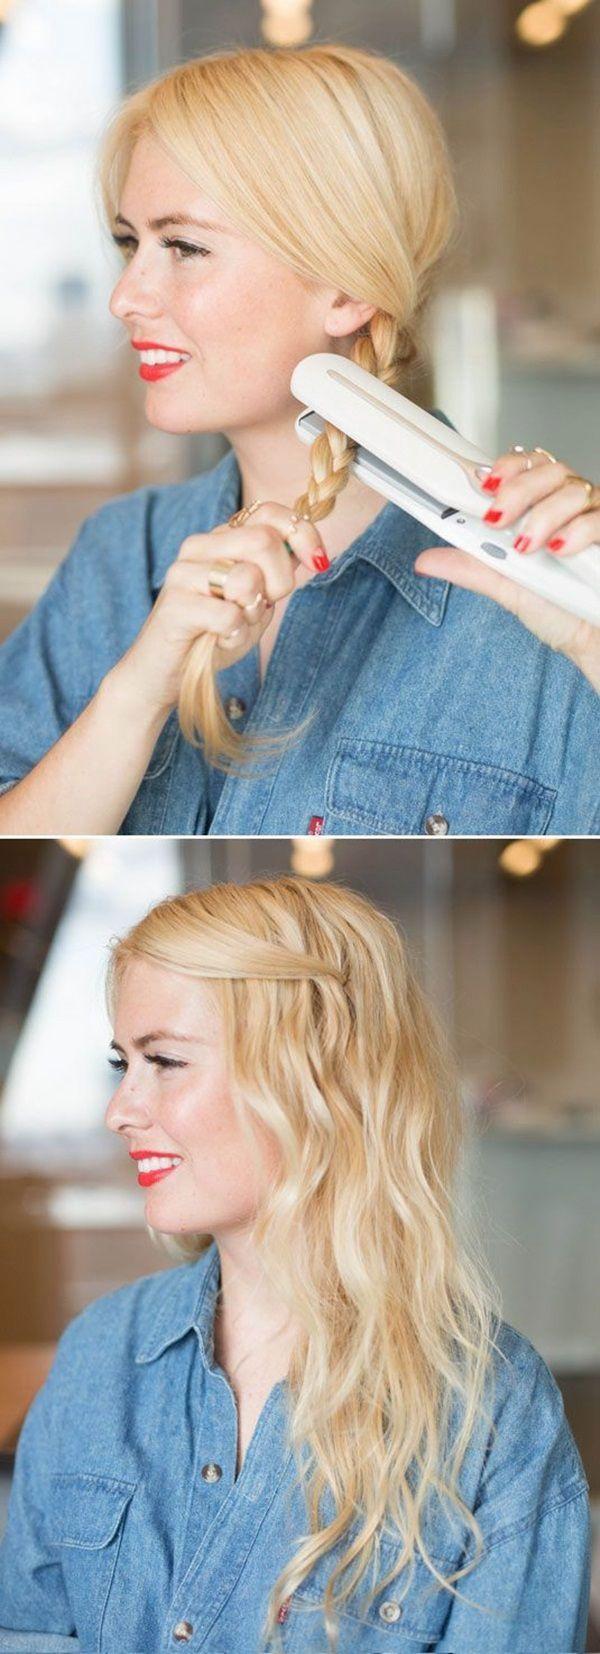 Pin By Hello Glow On Easy Hair Ideas Hair Hair Styles Hair Hacks